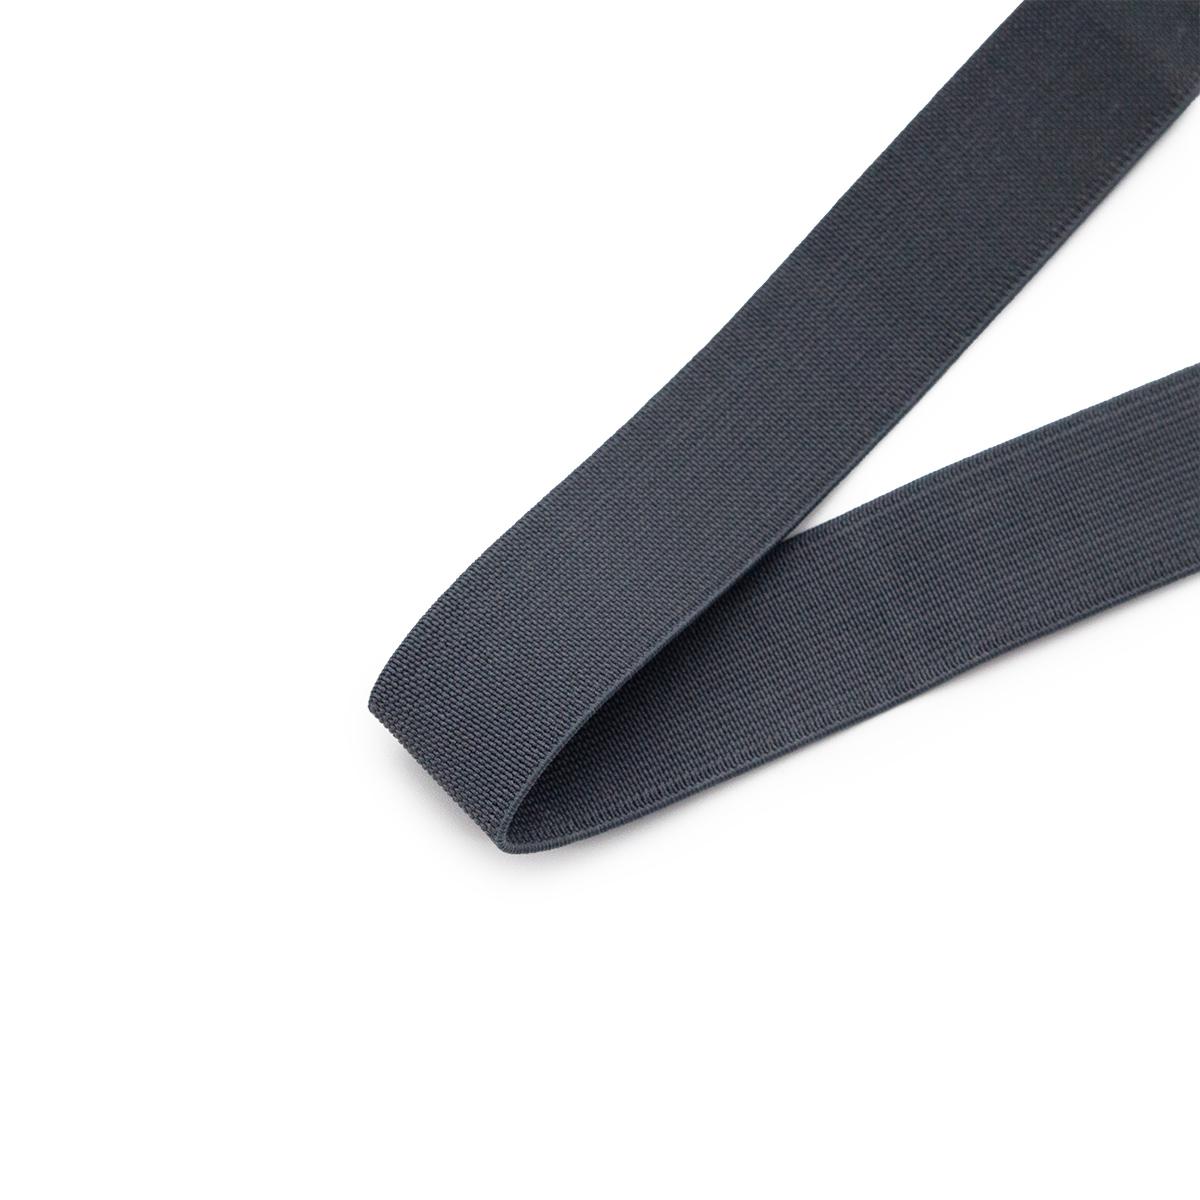 15-3848/1748 Резинка вязаная 25мм*25м т.серый